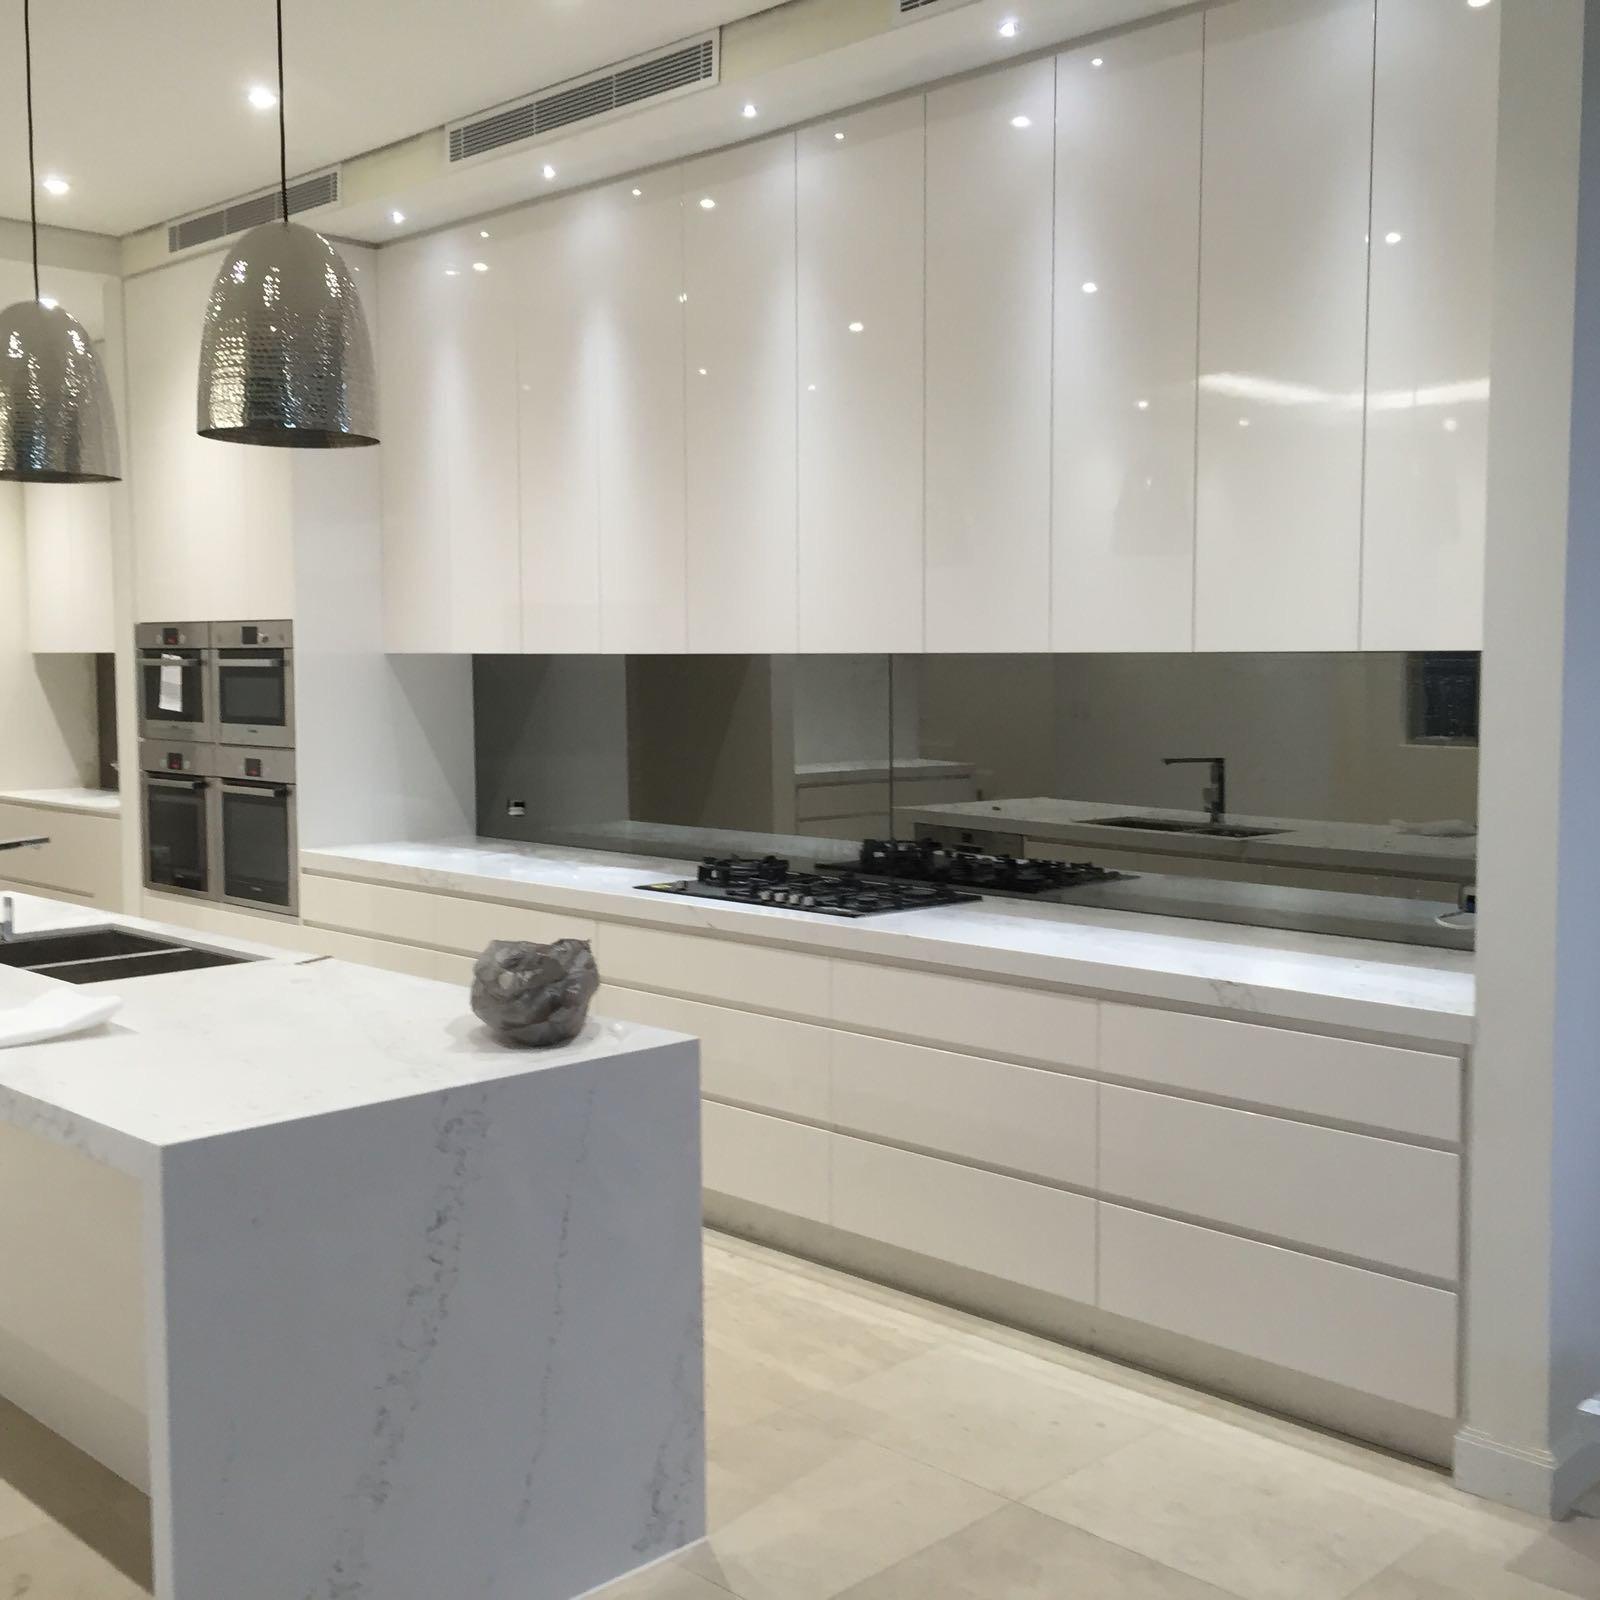 Bathroom Renovations Western Sydney: Kitchen & Bathrooms